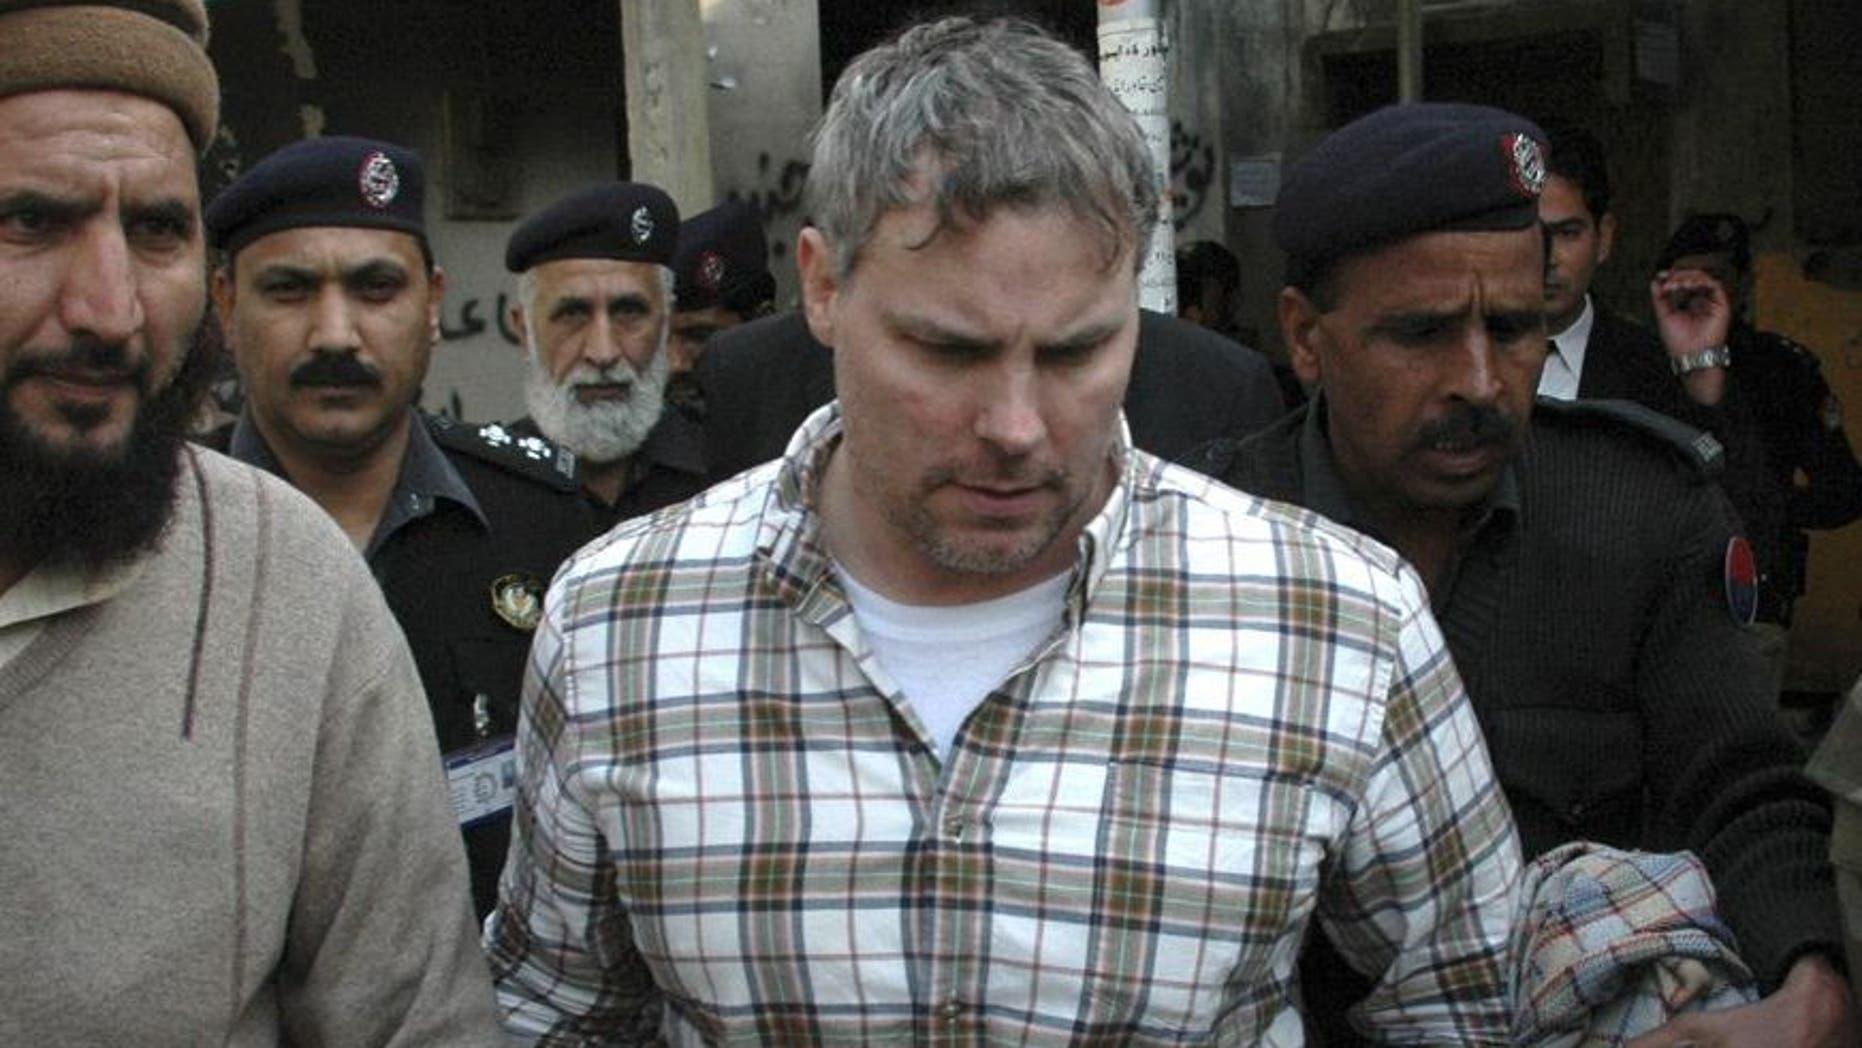 CIA Operative Raymond Davis (AP Photo)